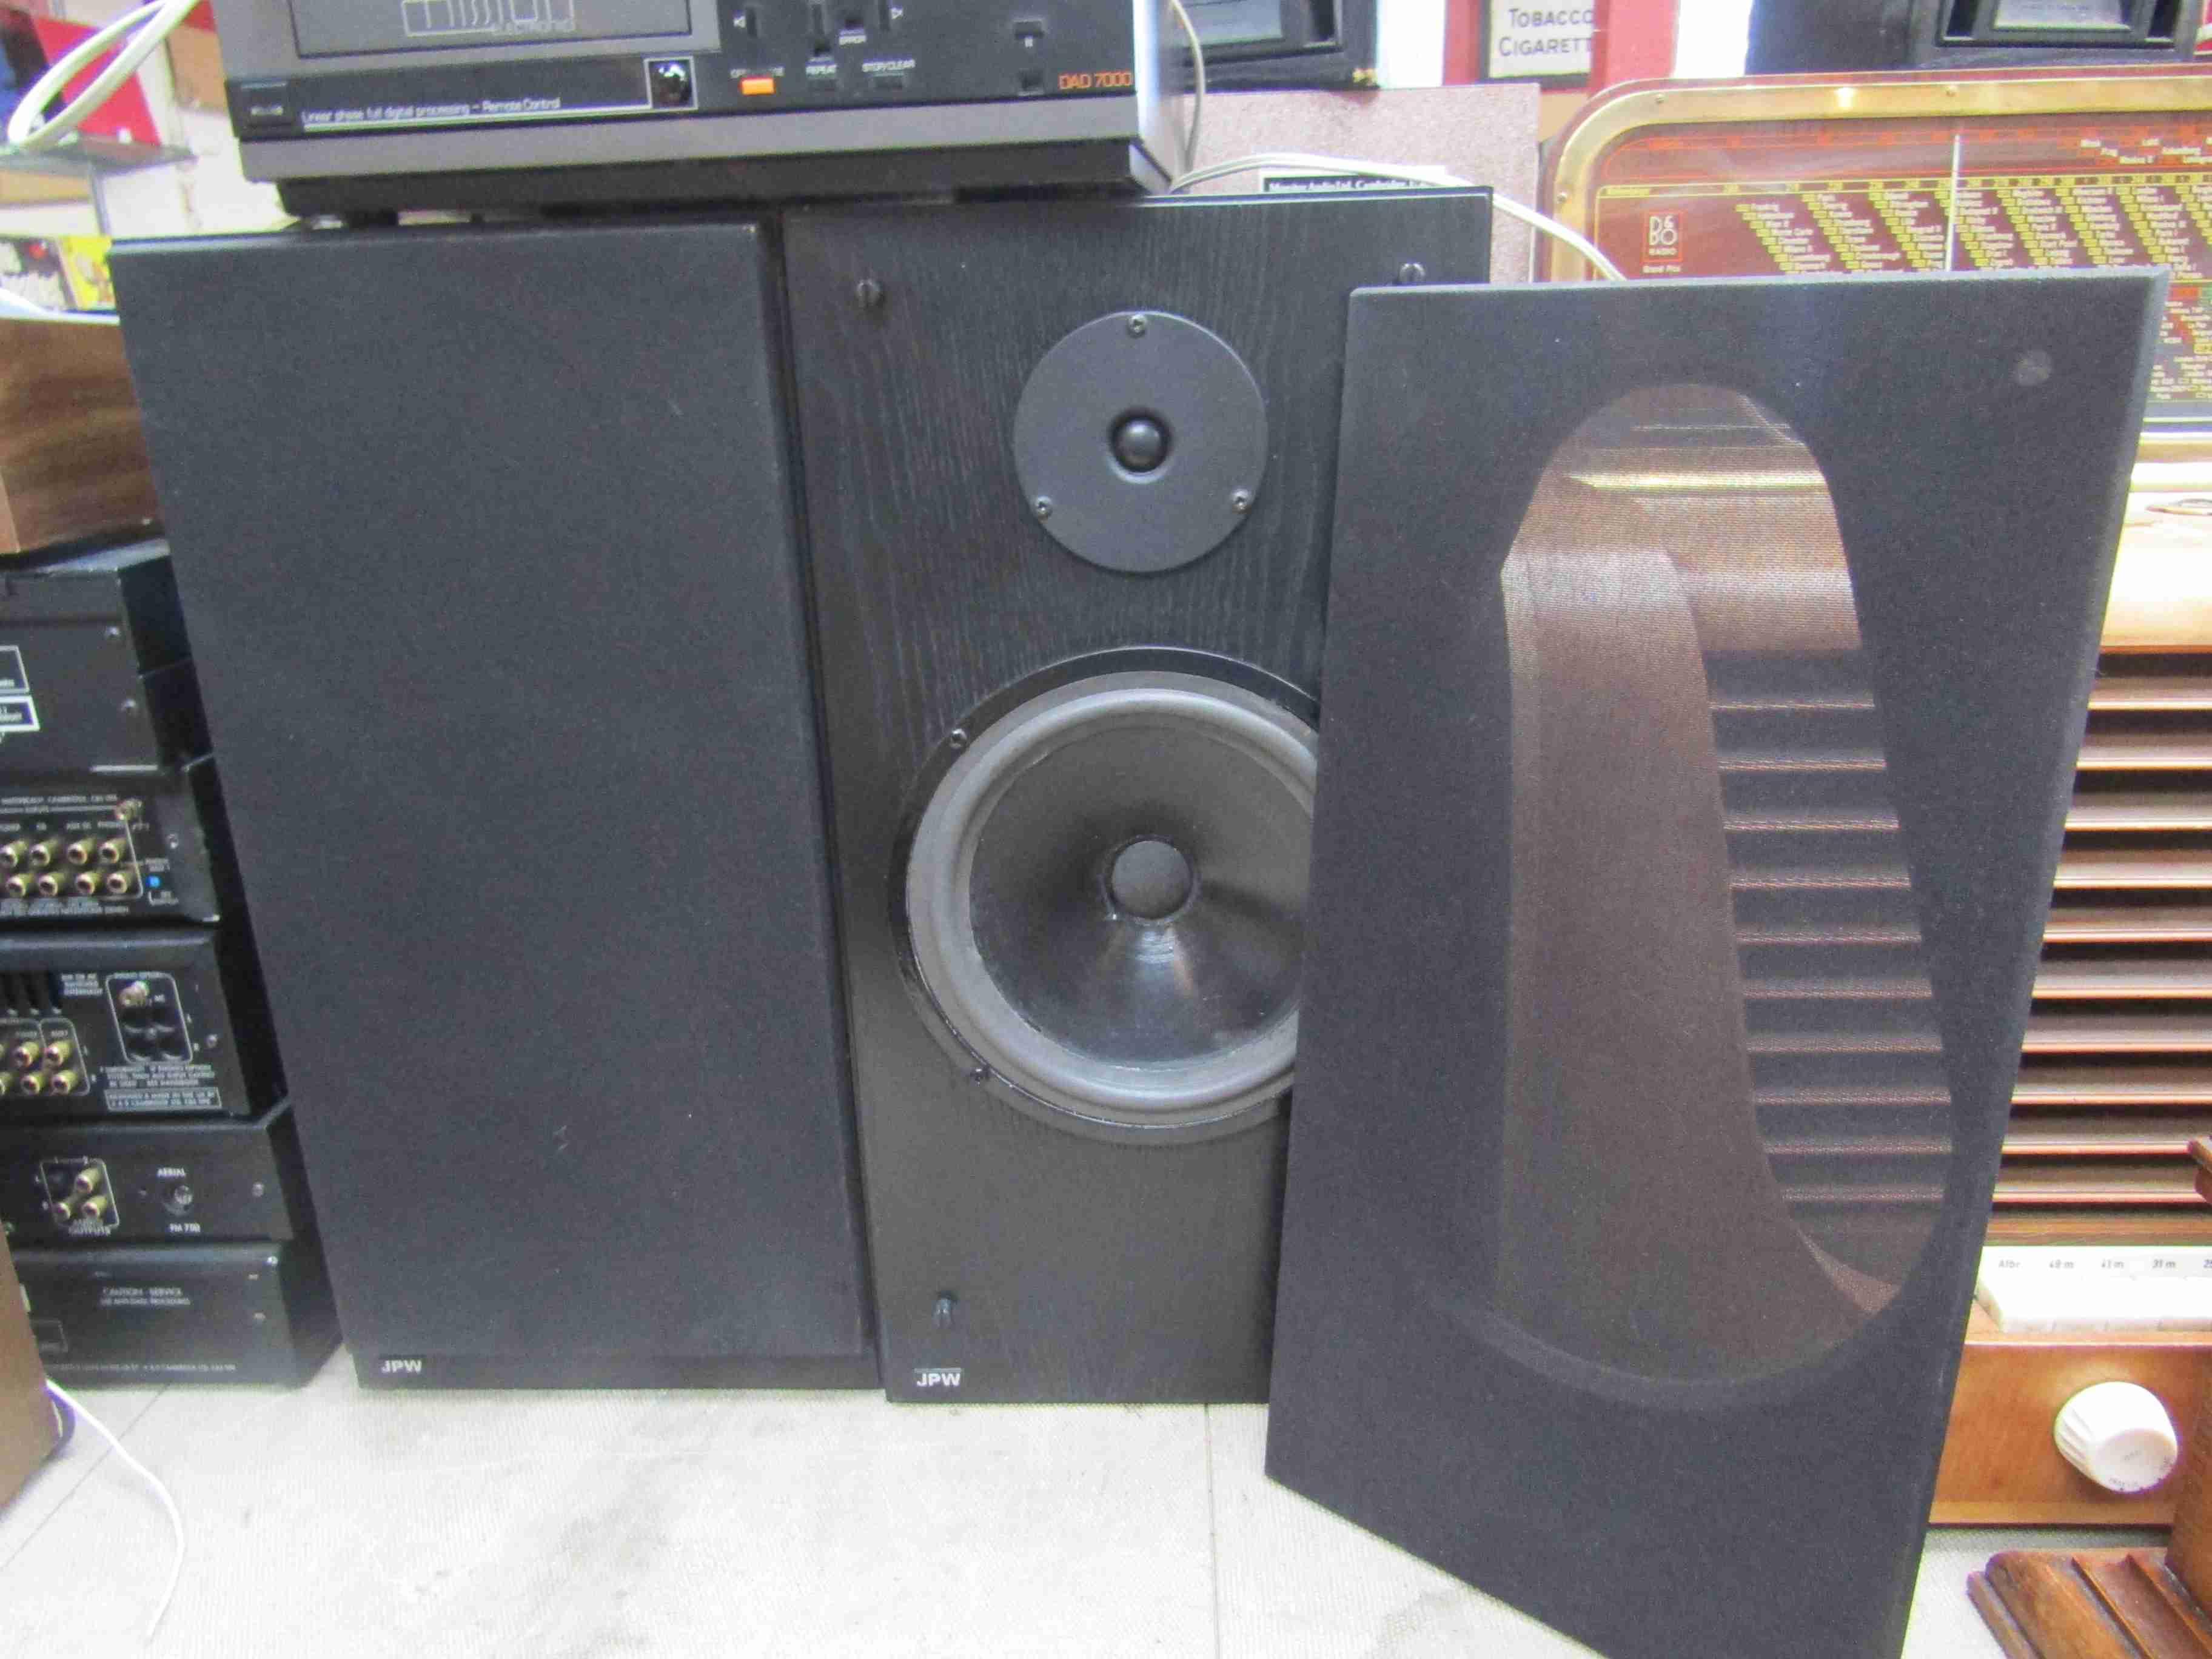 A pair of JPW AP3 speakers